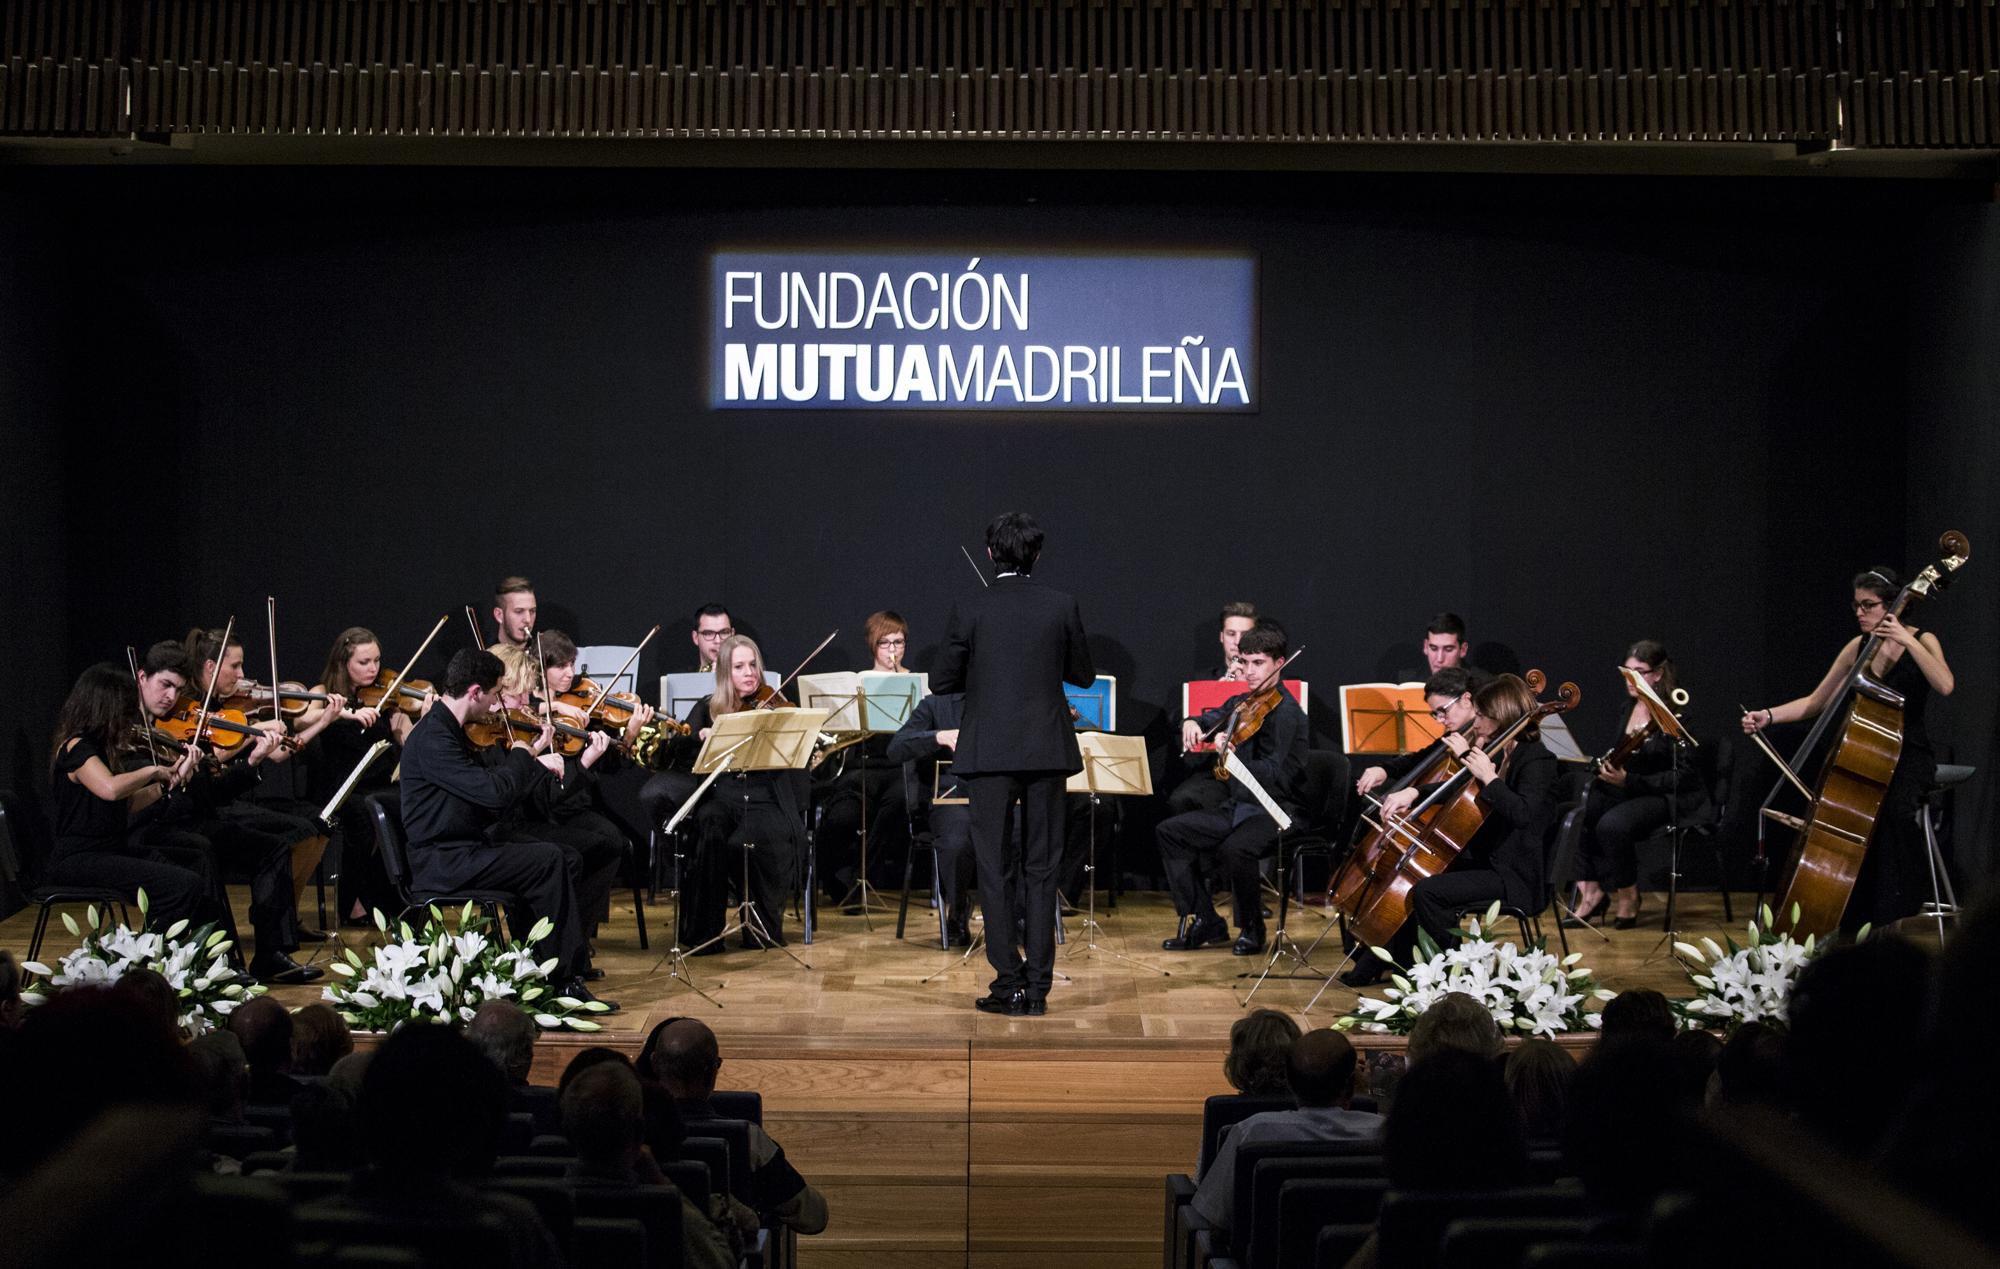 La Fundación Mutua Madrileña invita a concierto de música clásica con European Royal Ensemble